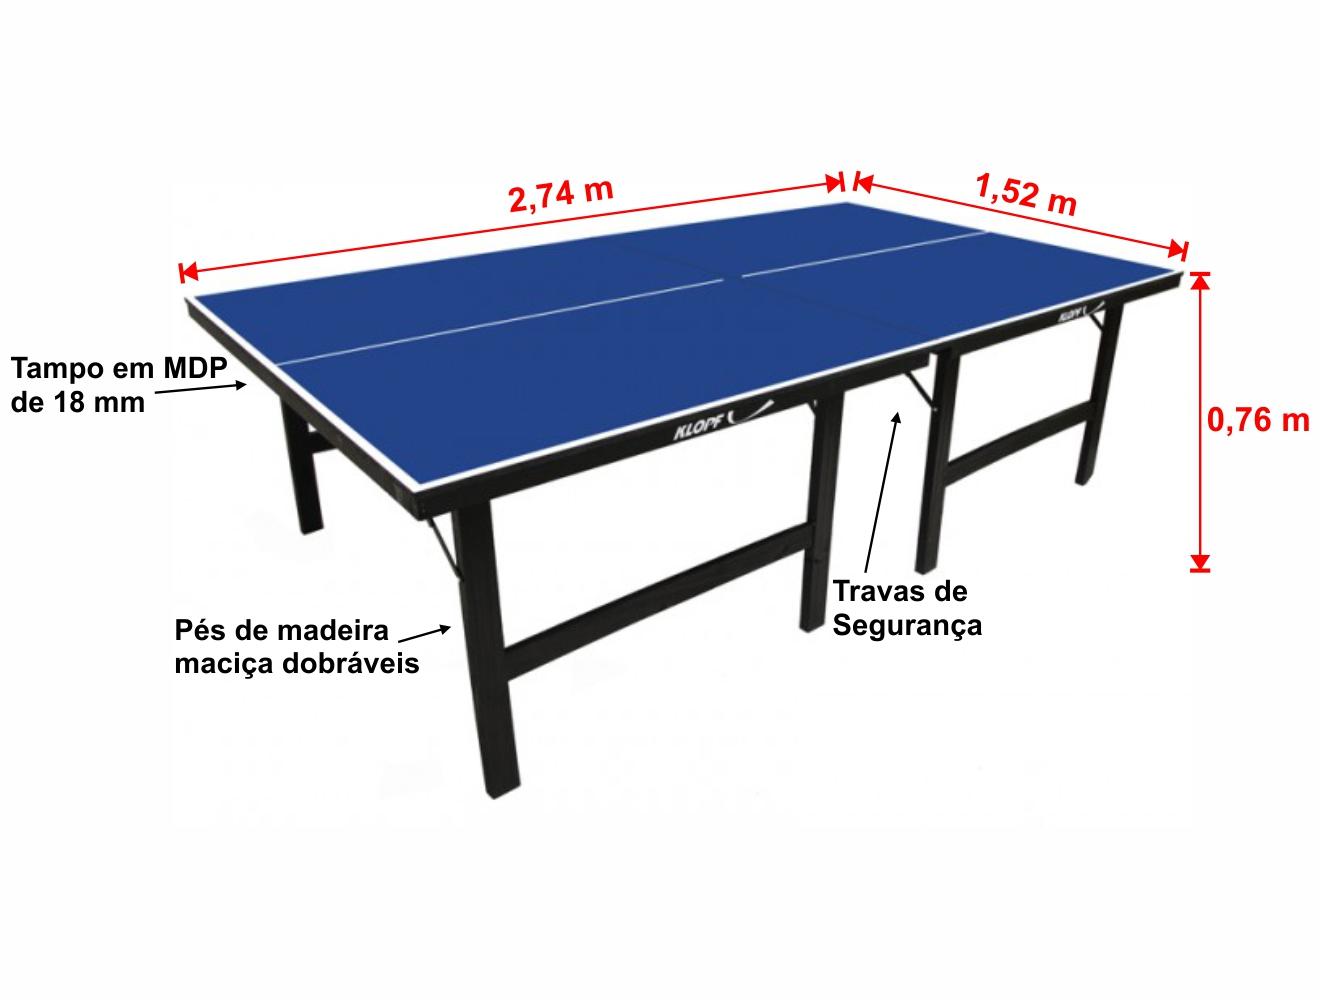 6596b5db58810 Mesa de Tênis de Mesa Ping Pong Klopf 1002 MDP 18mm - Estilo Esportivo